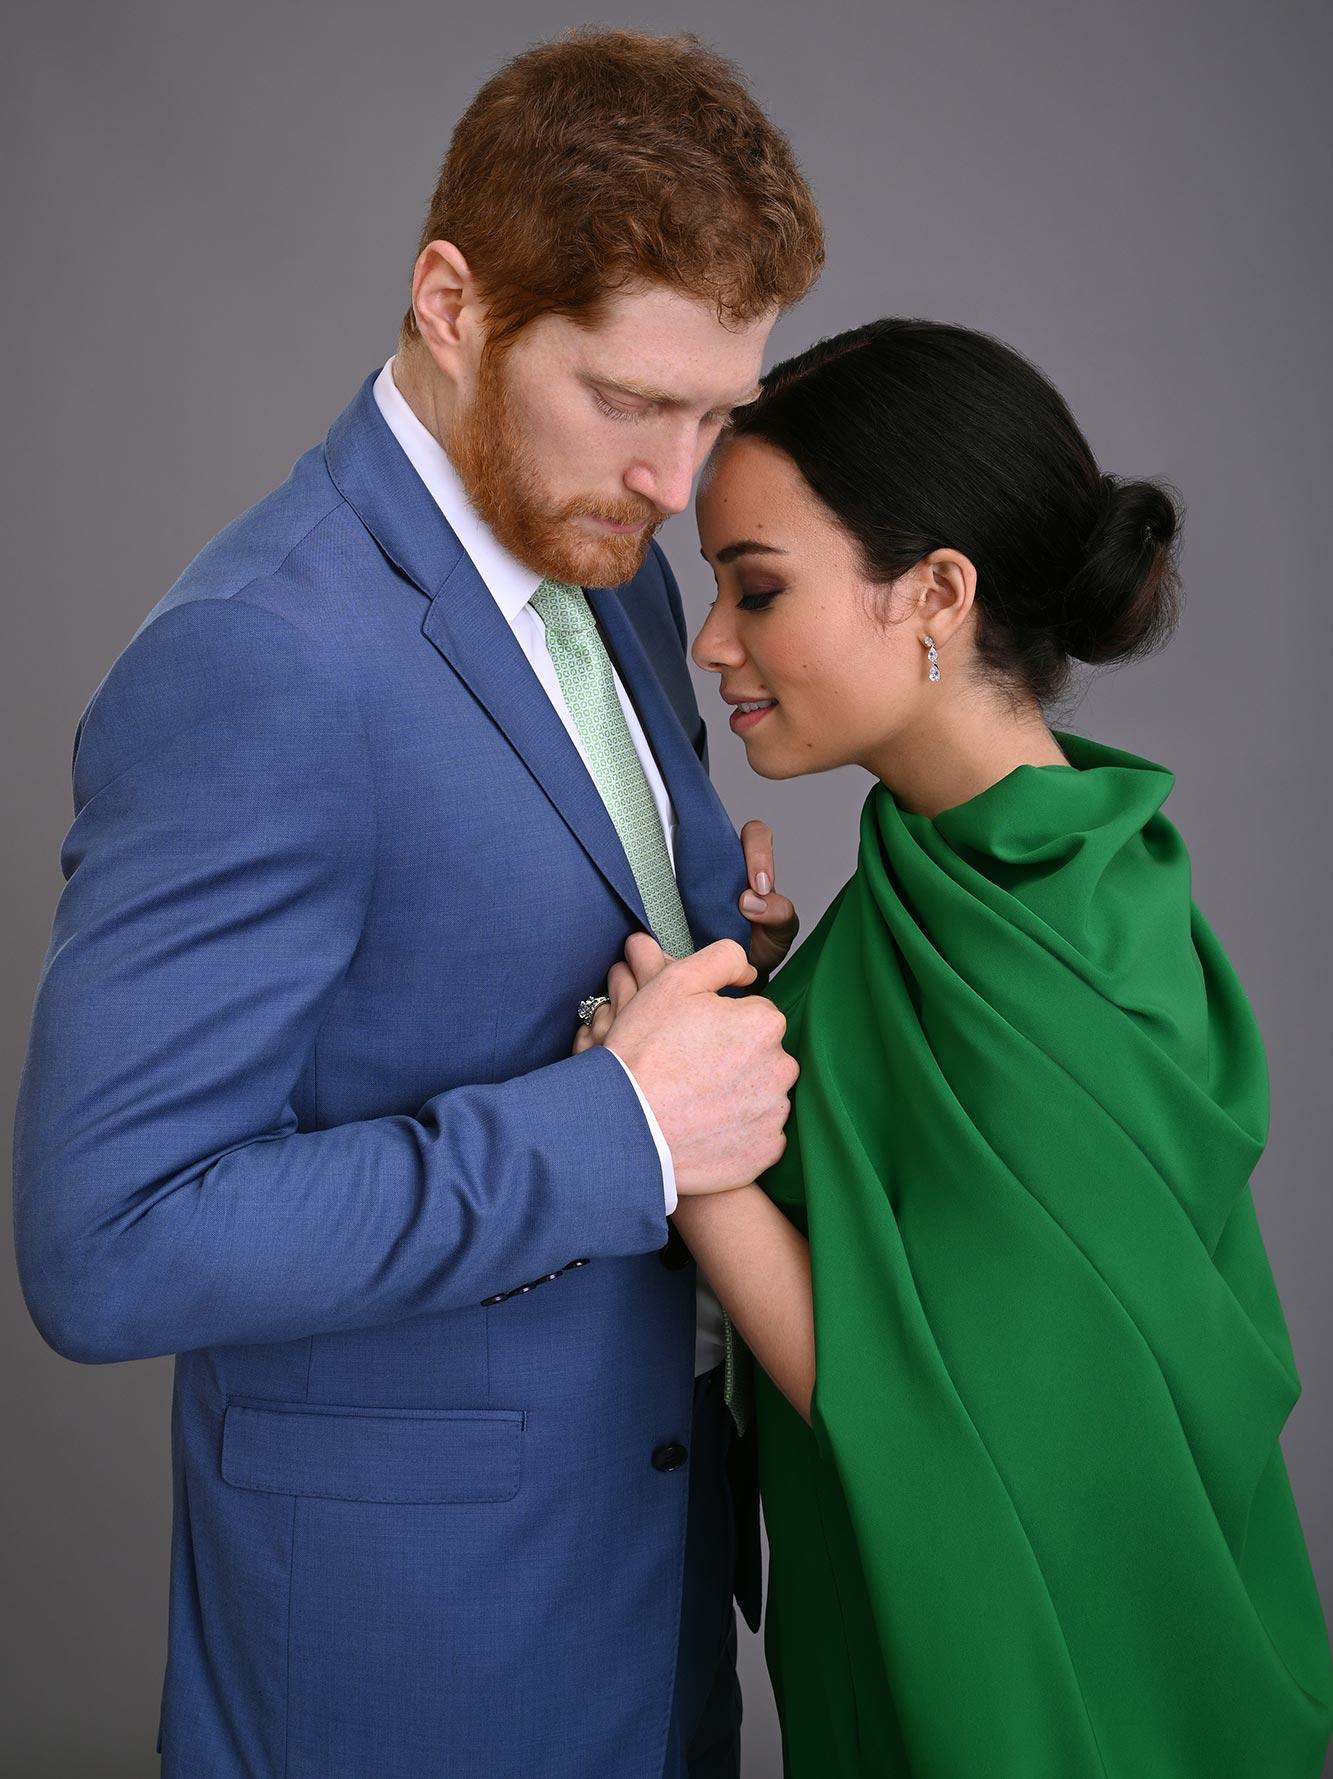 Get a sneak peek at Lifetime's new Prince Harry and Meghan movie – FilmyOne.com